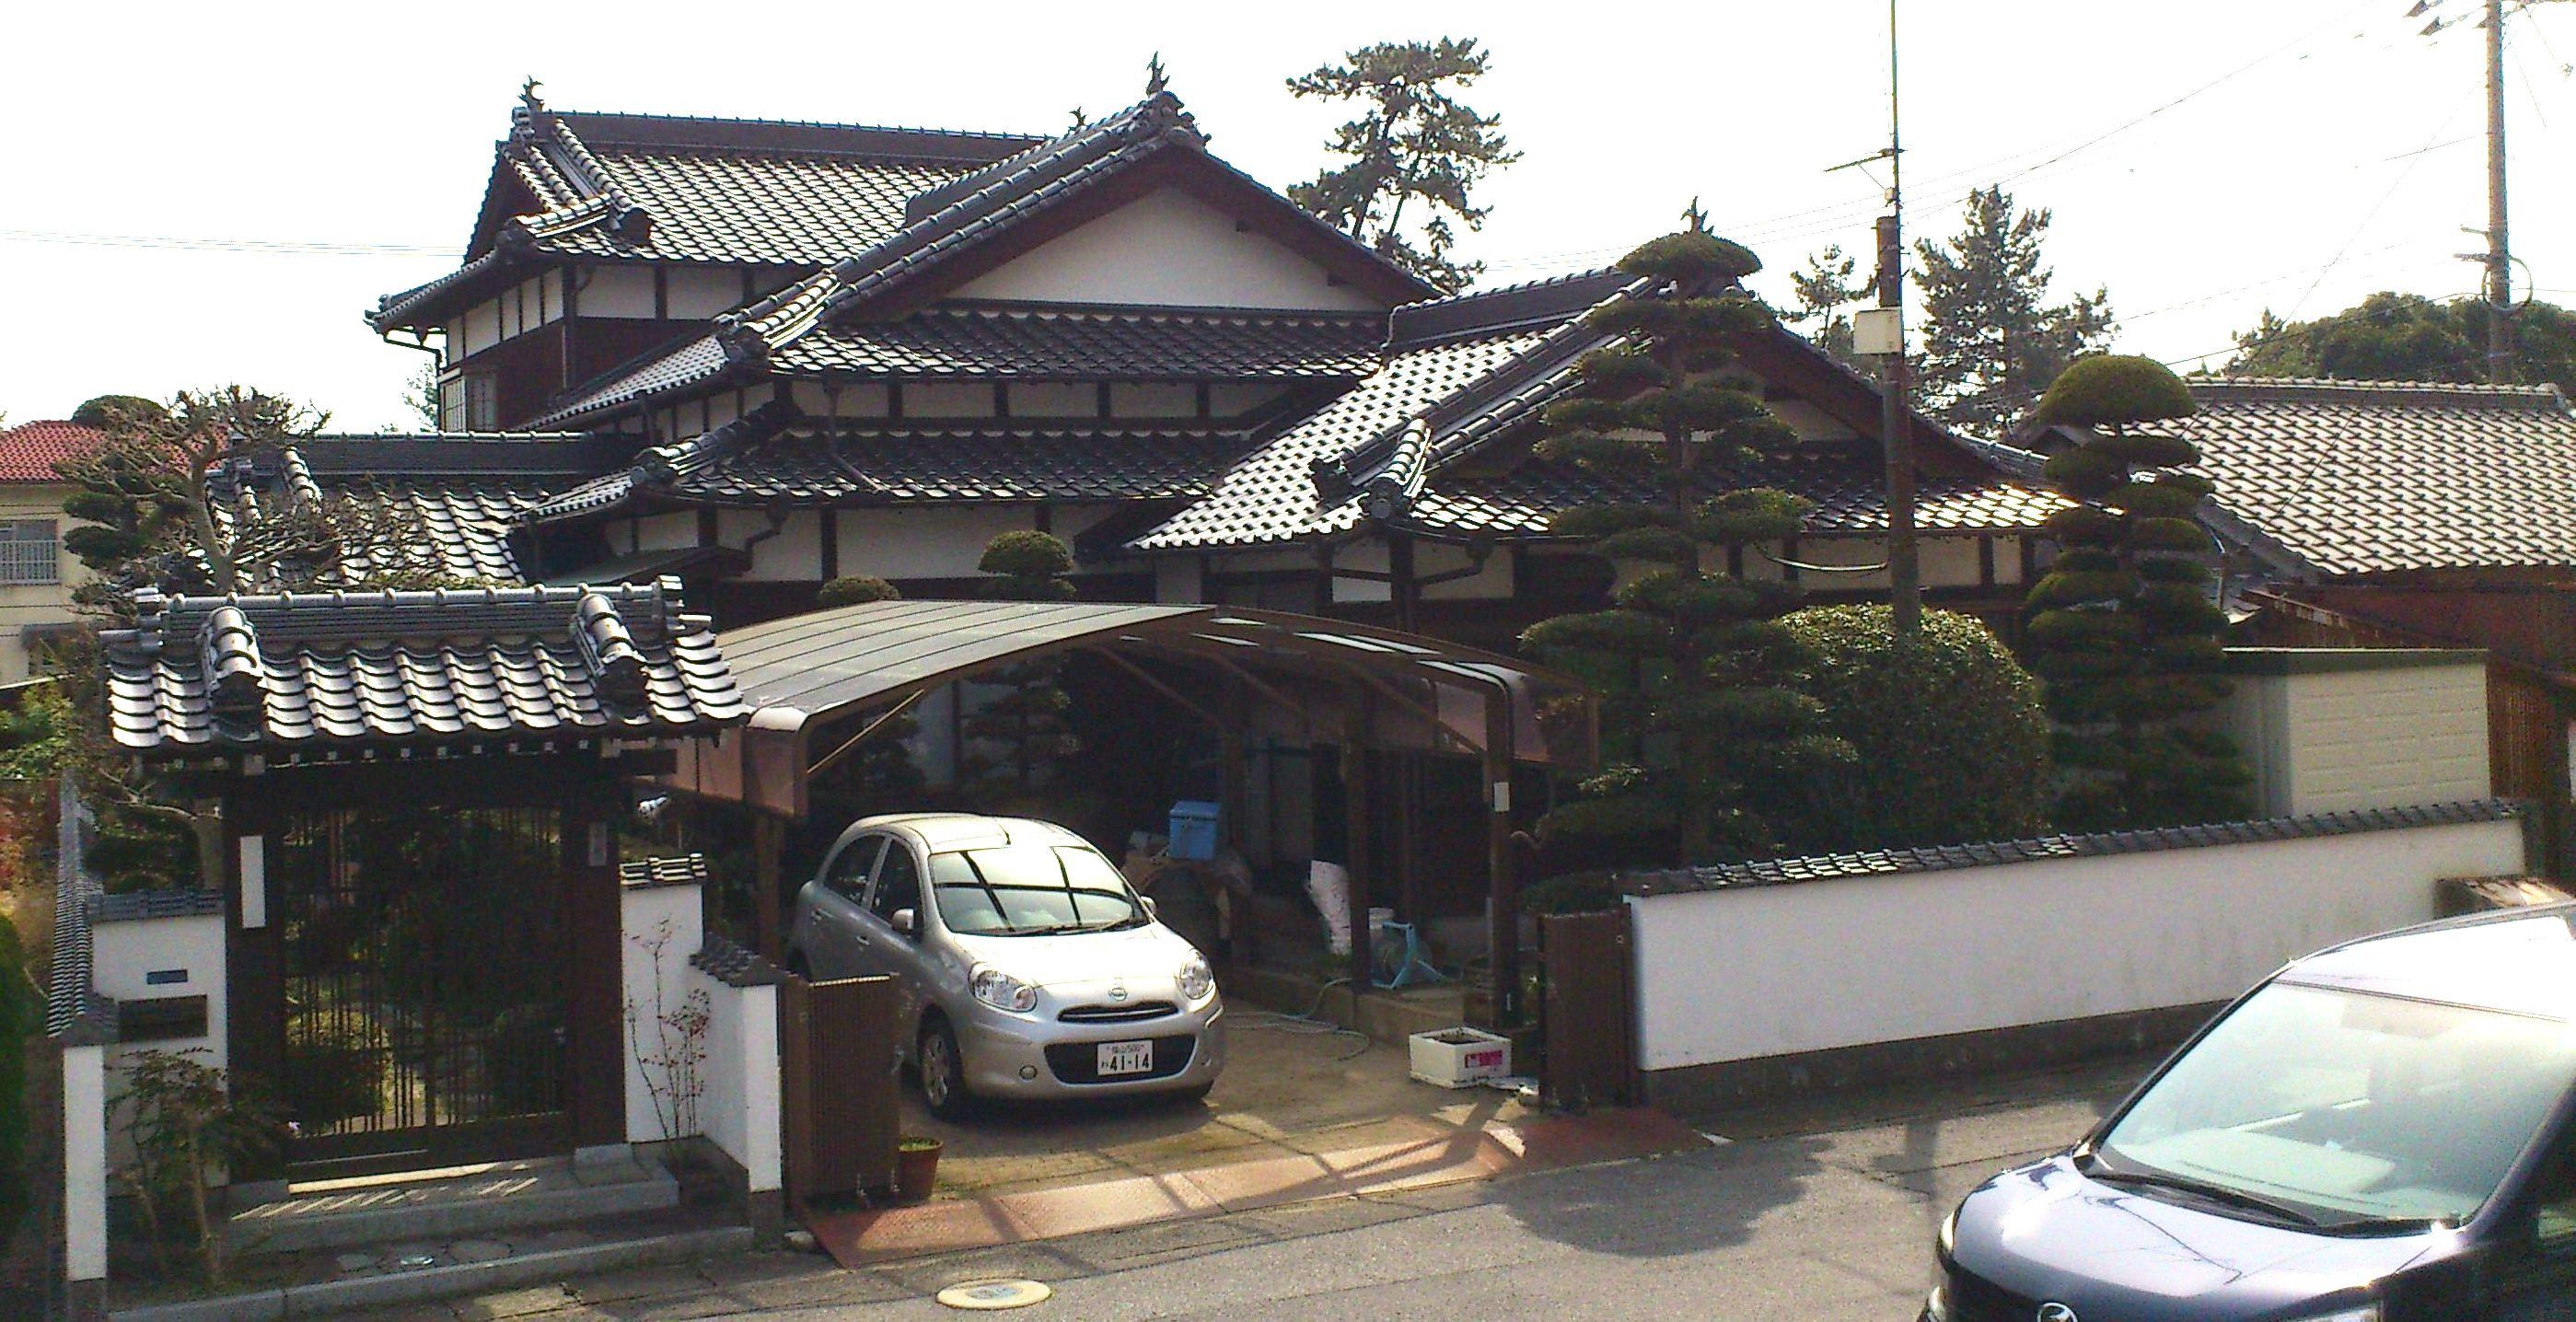 日本家屋 - Buscar con Google